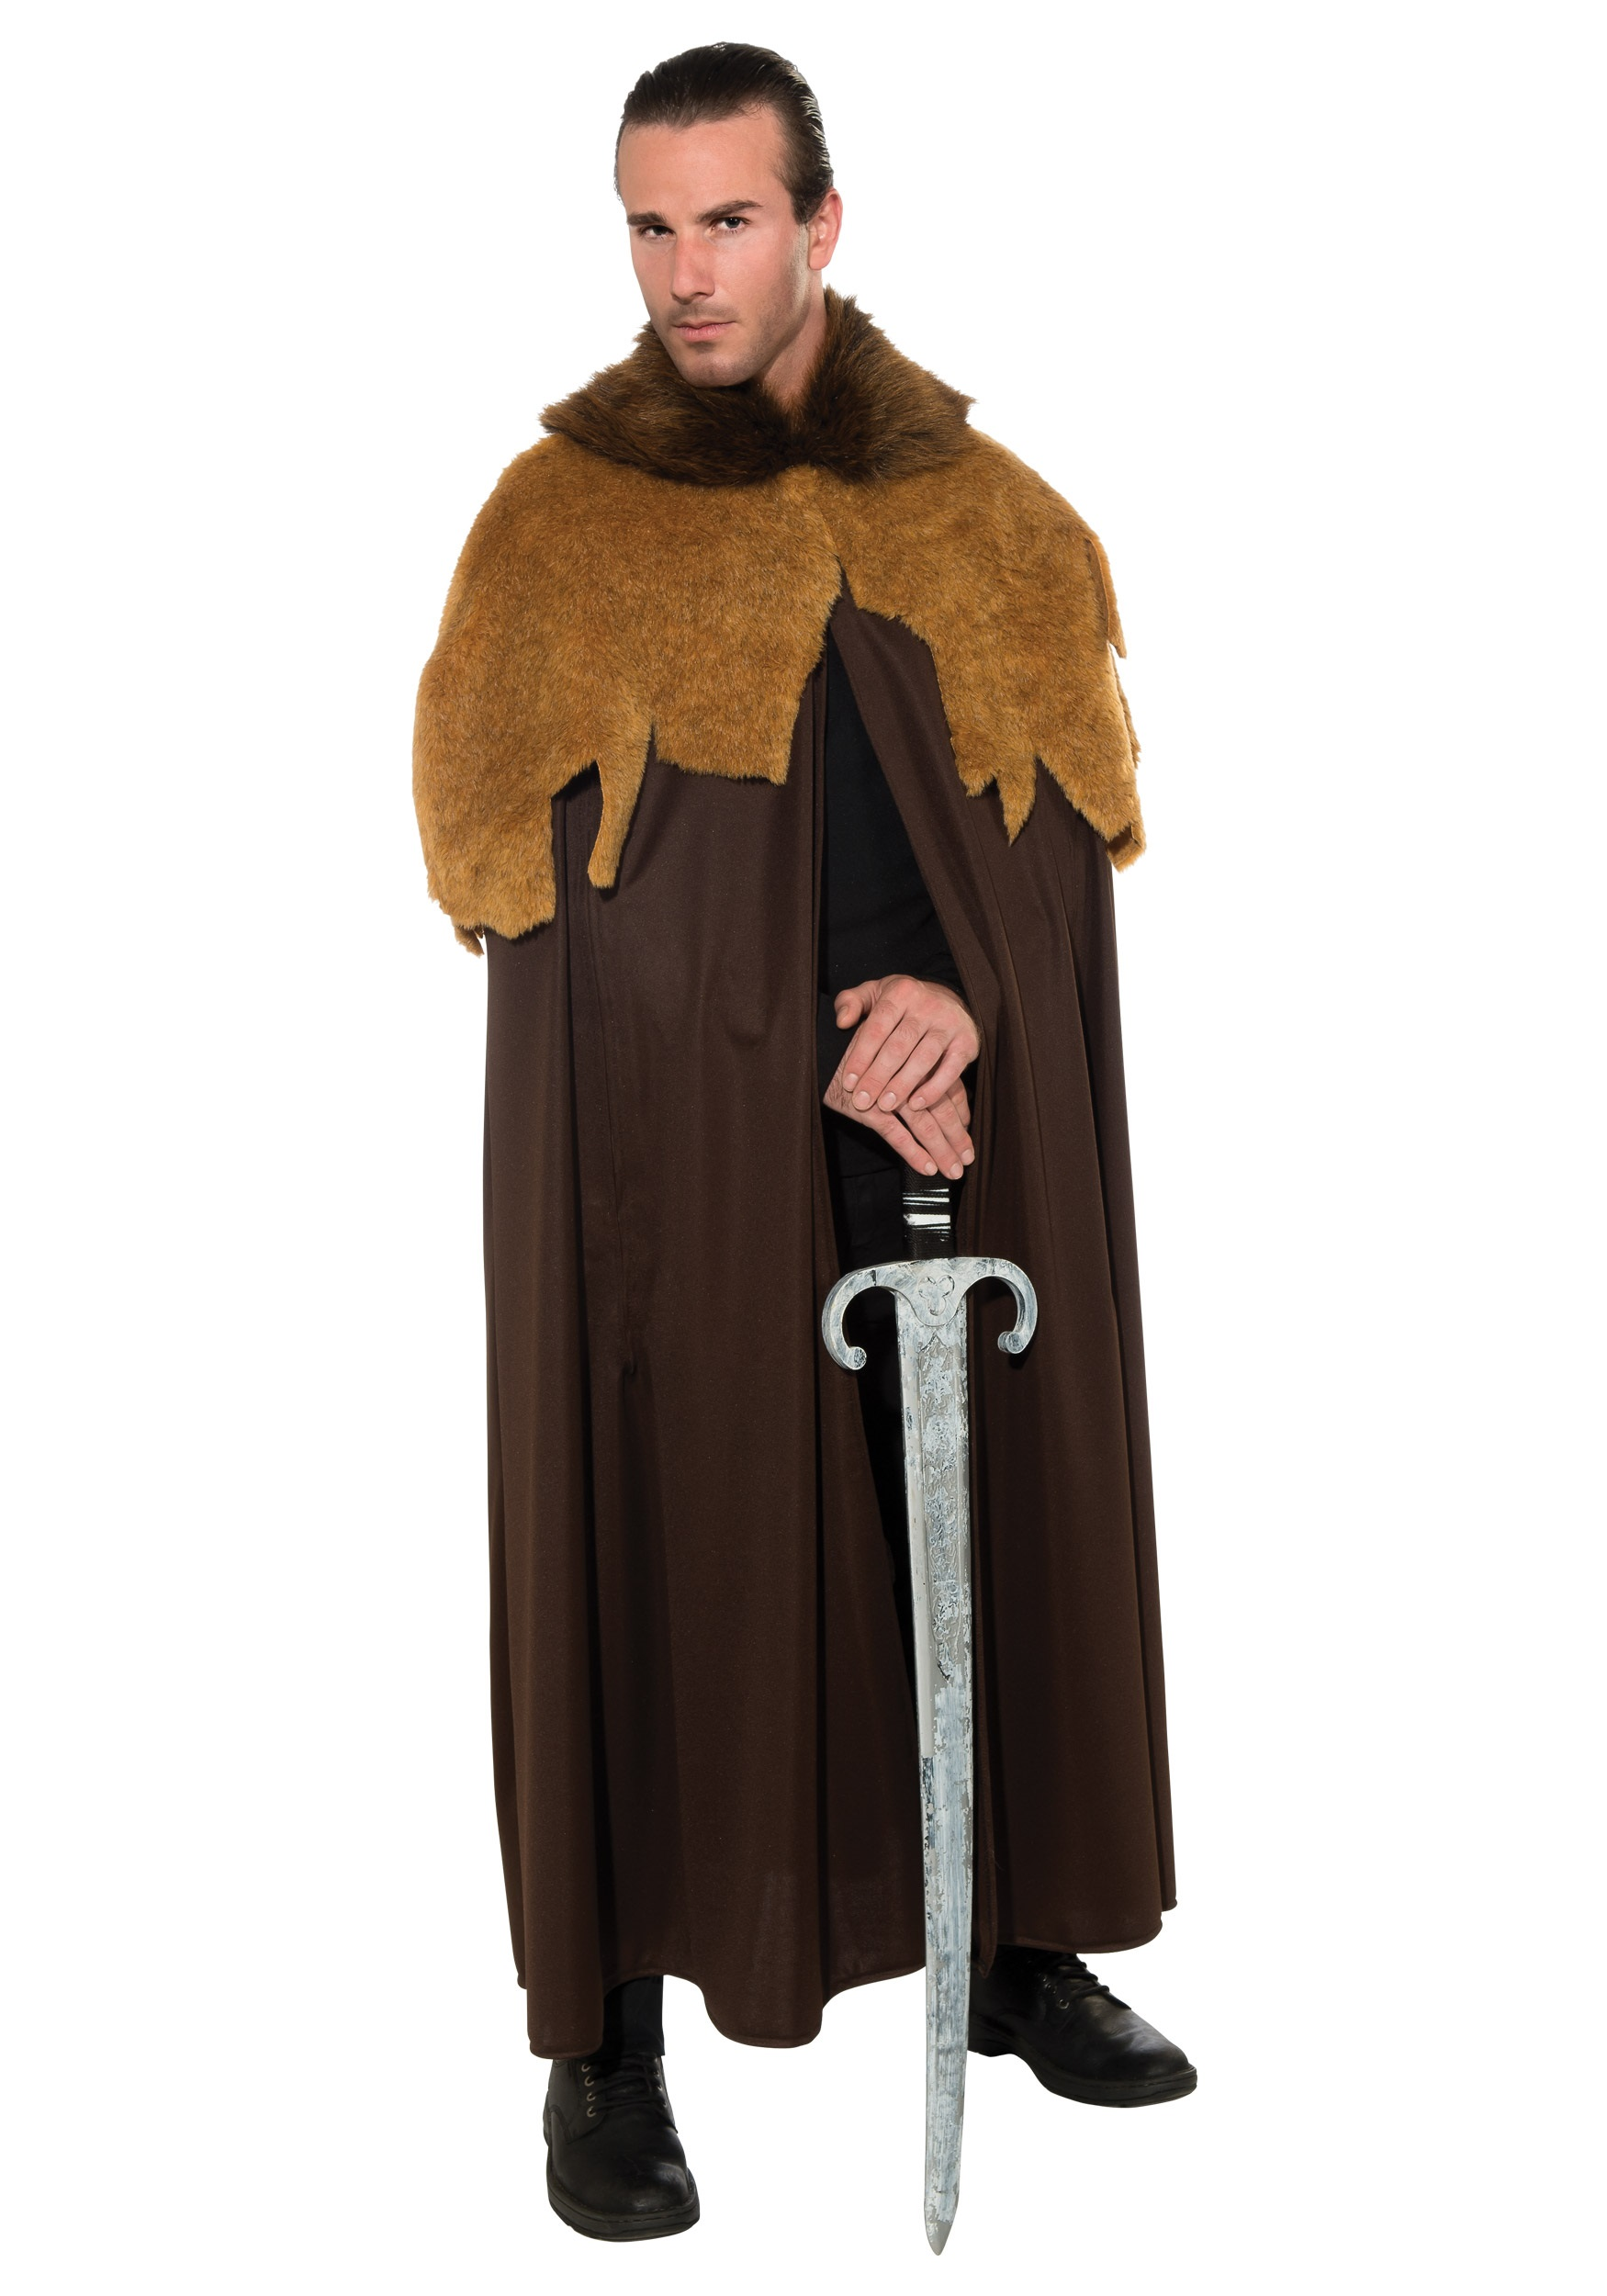 Men's Medieval Warrior Cloak Costume